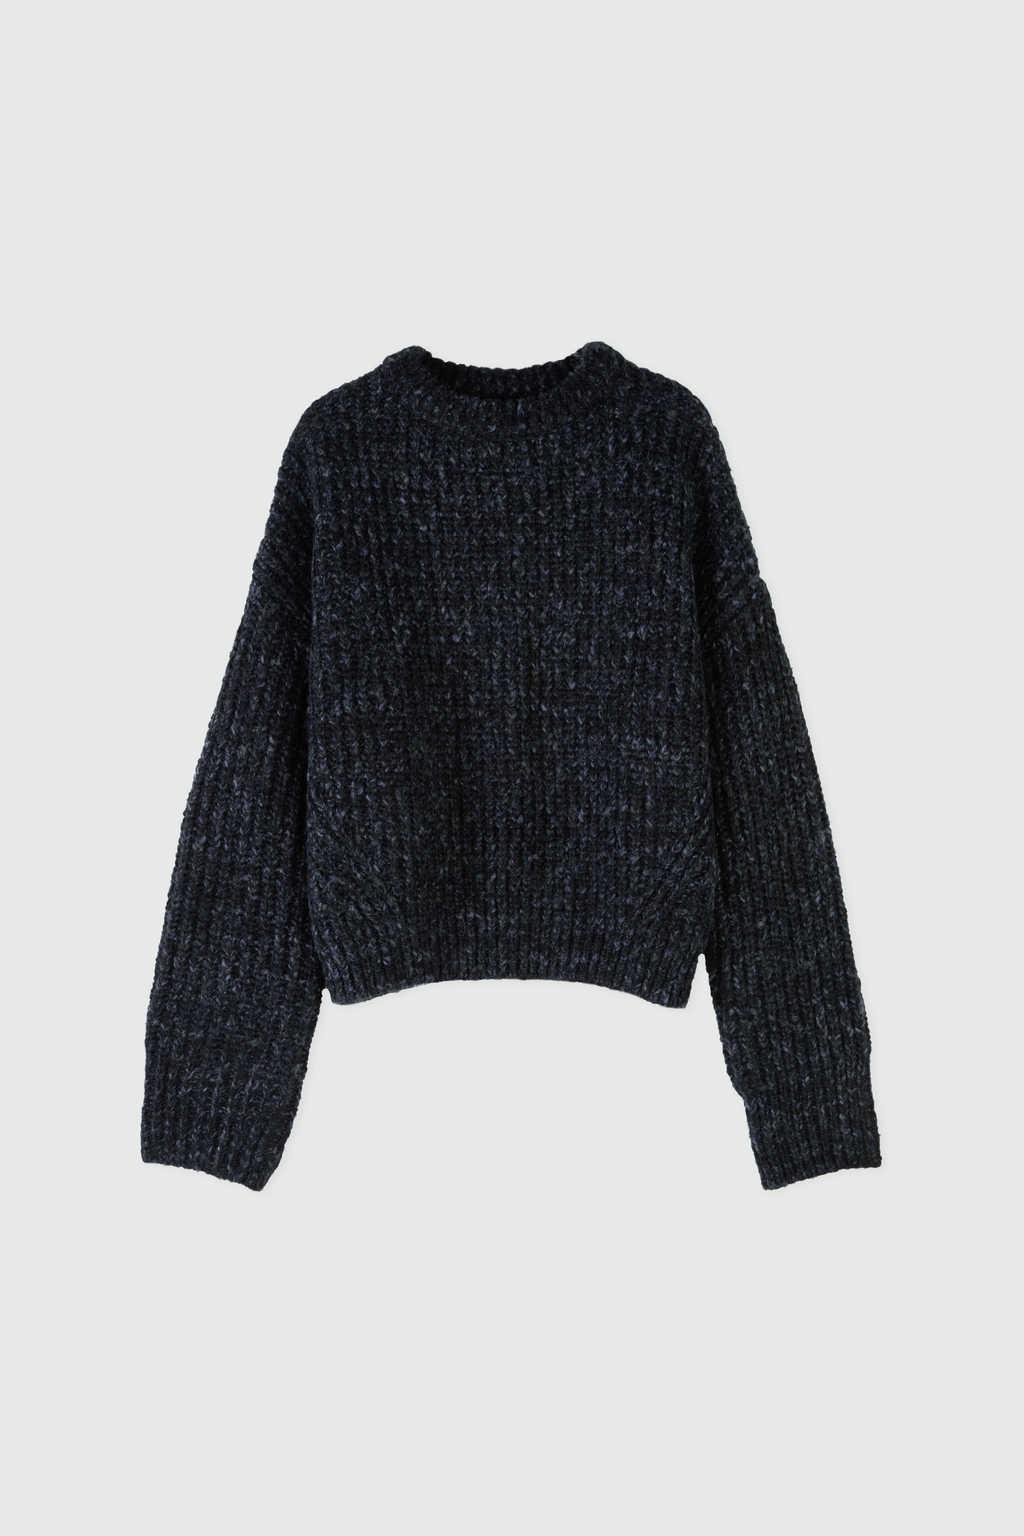 Sweater 2775 Black 9